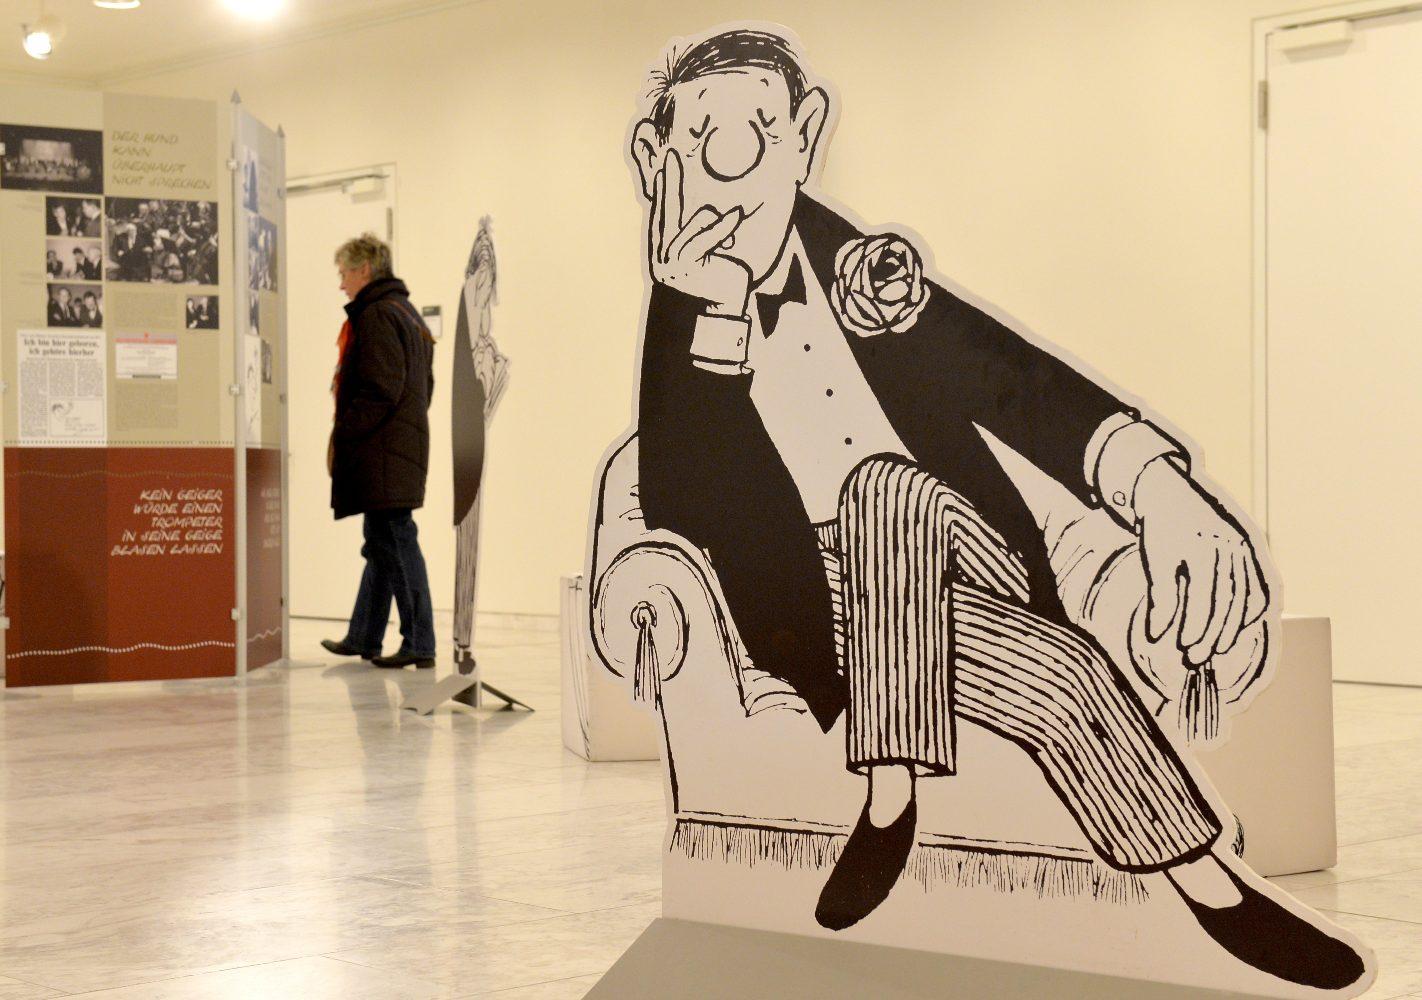 What a famous German cartoon can teach jobseekers